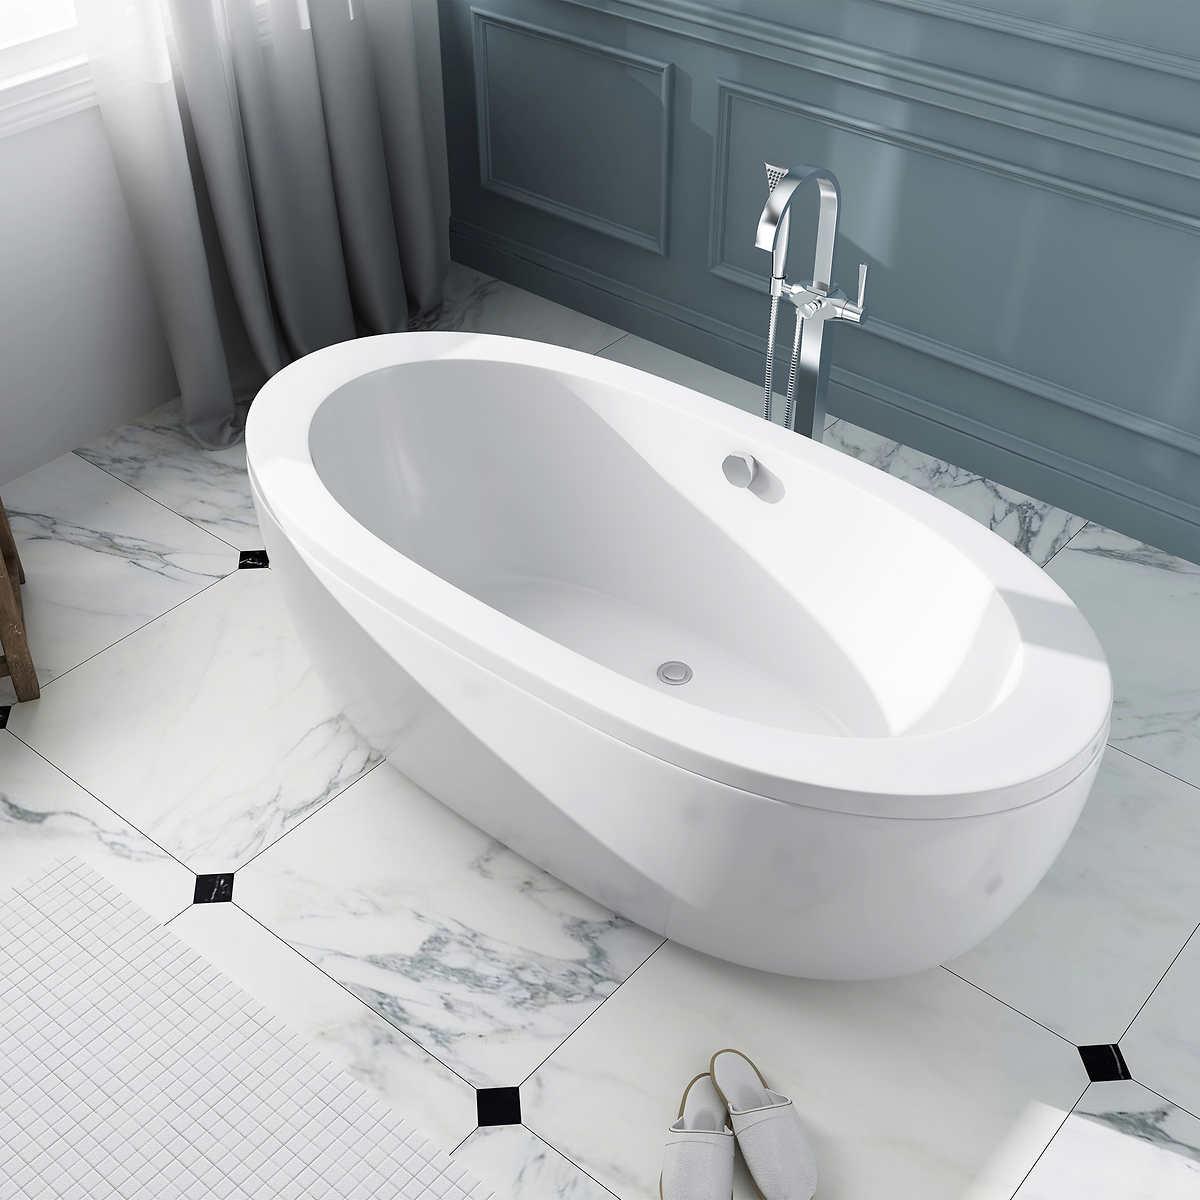 Tubs Costco - 55 inch freestanding tub